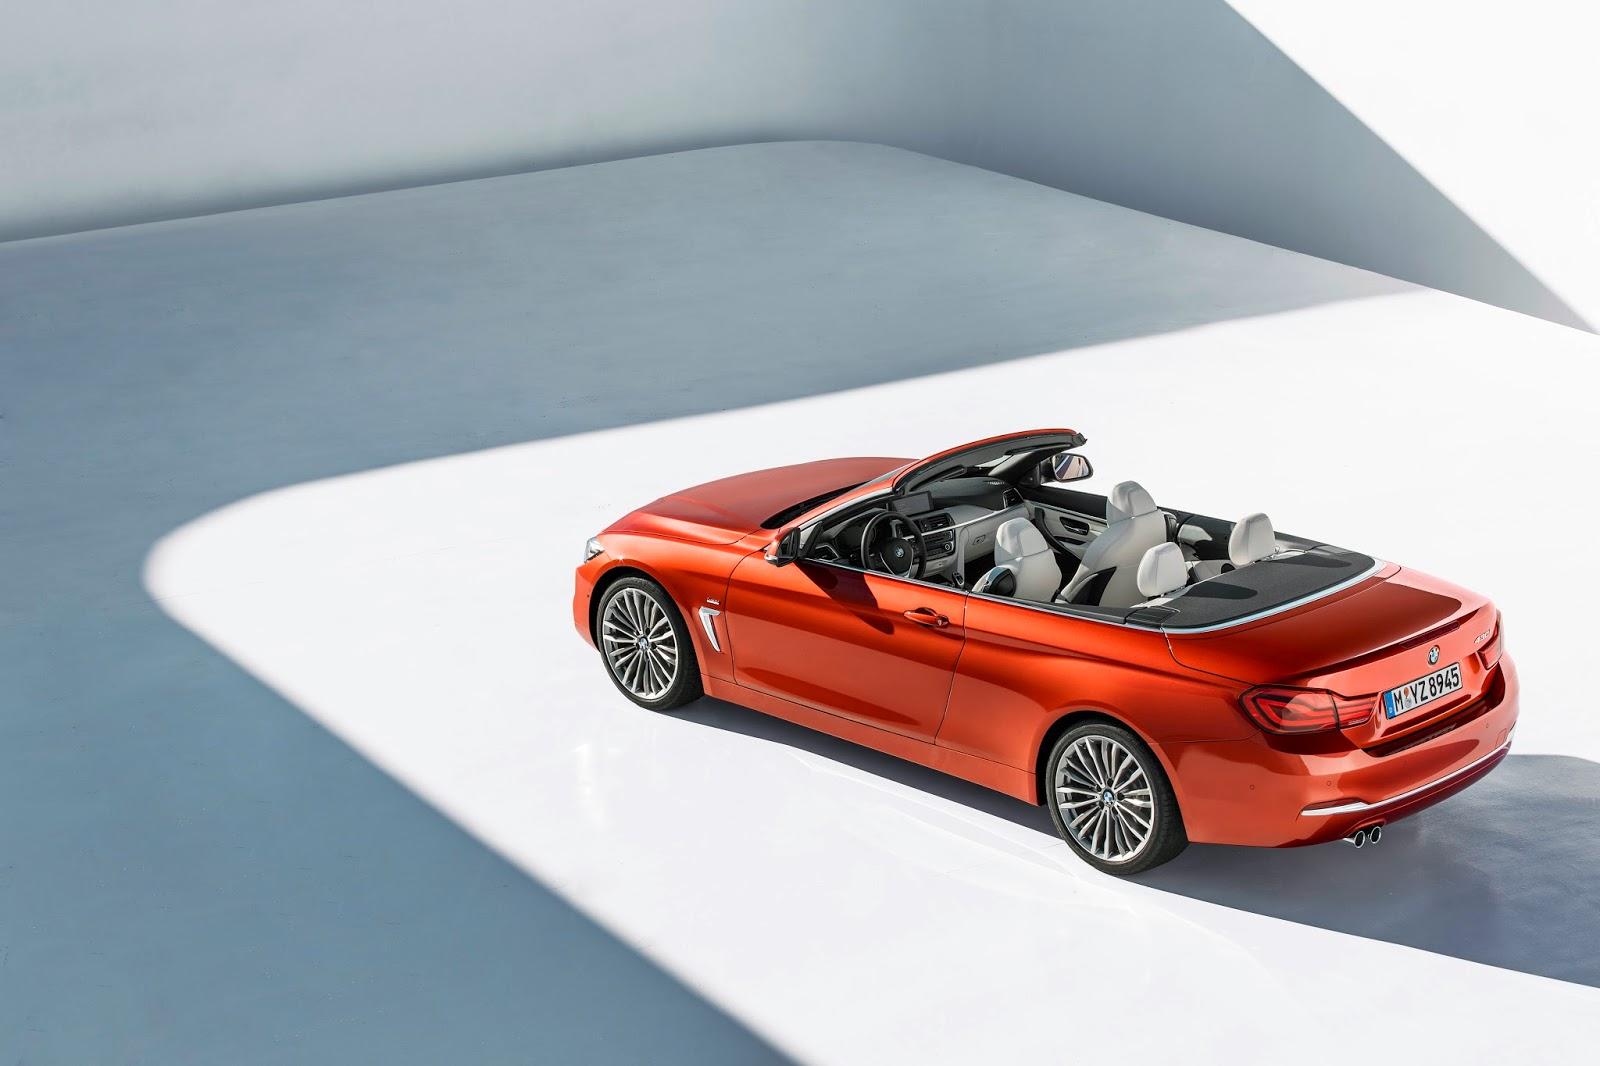 P90245260 highRes bmw 4 series luxury Η νέα BMW Σειρά 4, με πιο σφιχτή ρύθμιση ανάρτησης BMW, Bmw 4, BMW 4 Cabrio, BMW 4 Coupe, BMW 4 Gran Coupé, Facelift